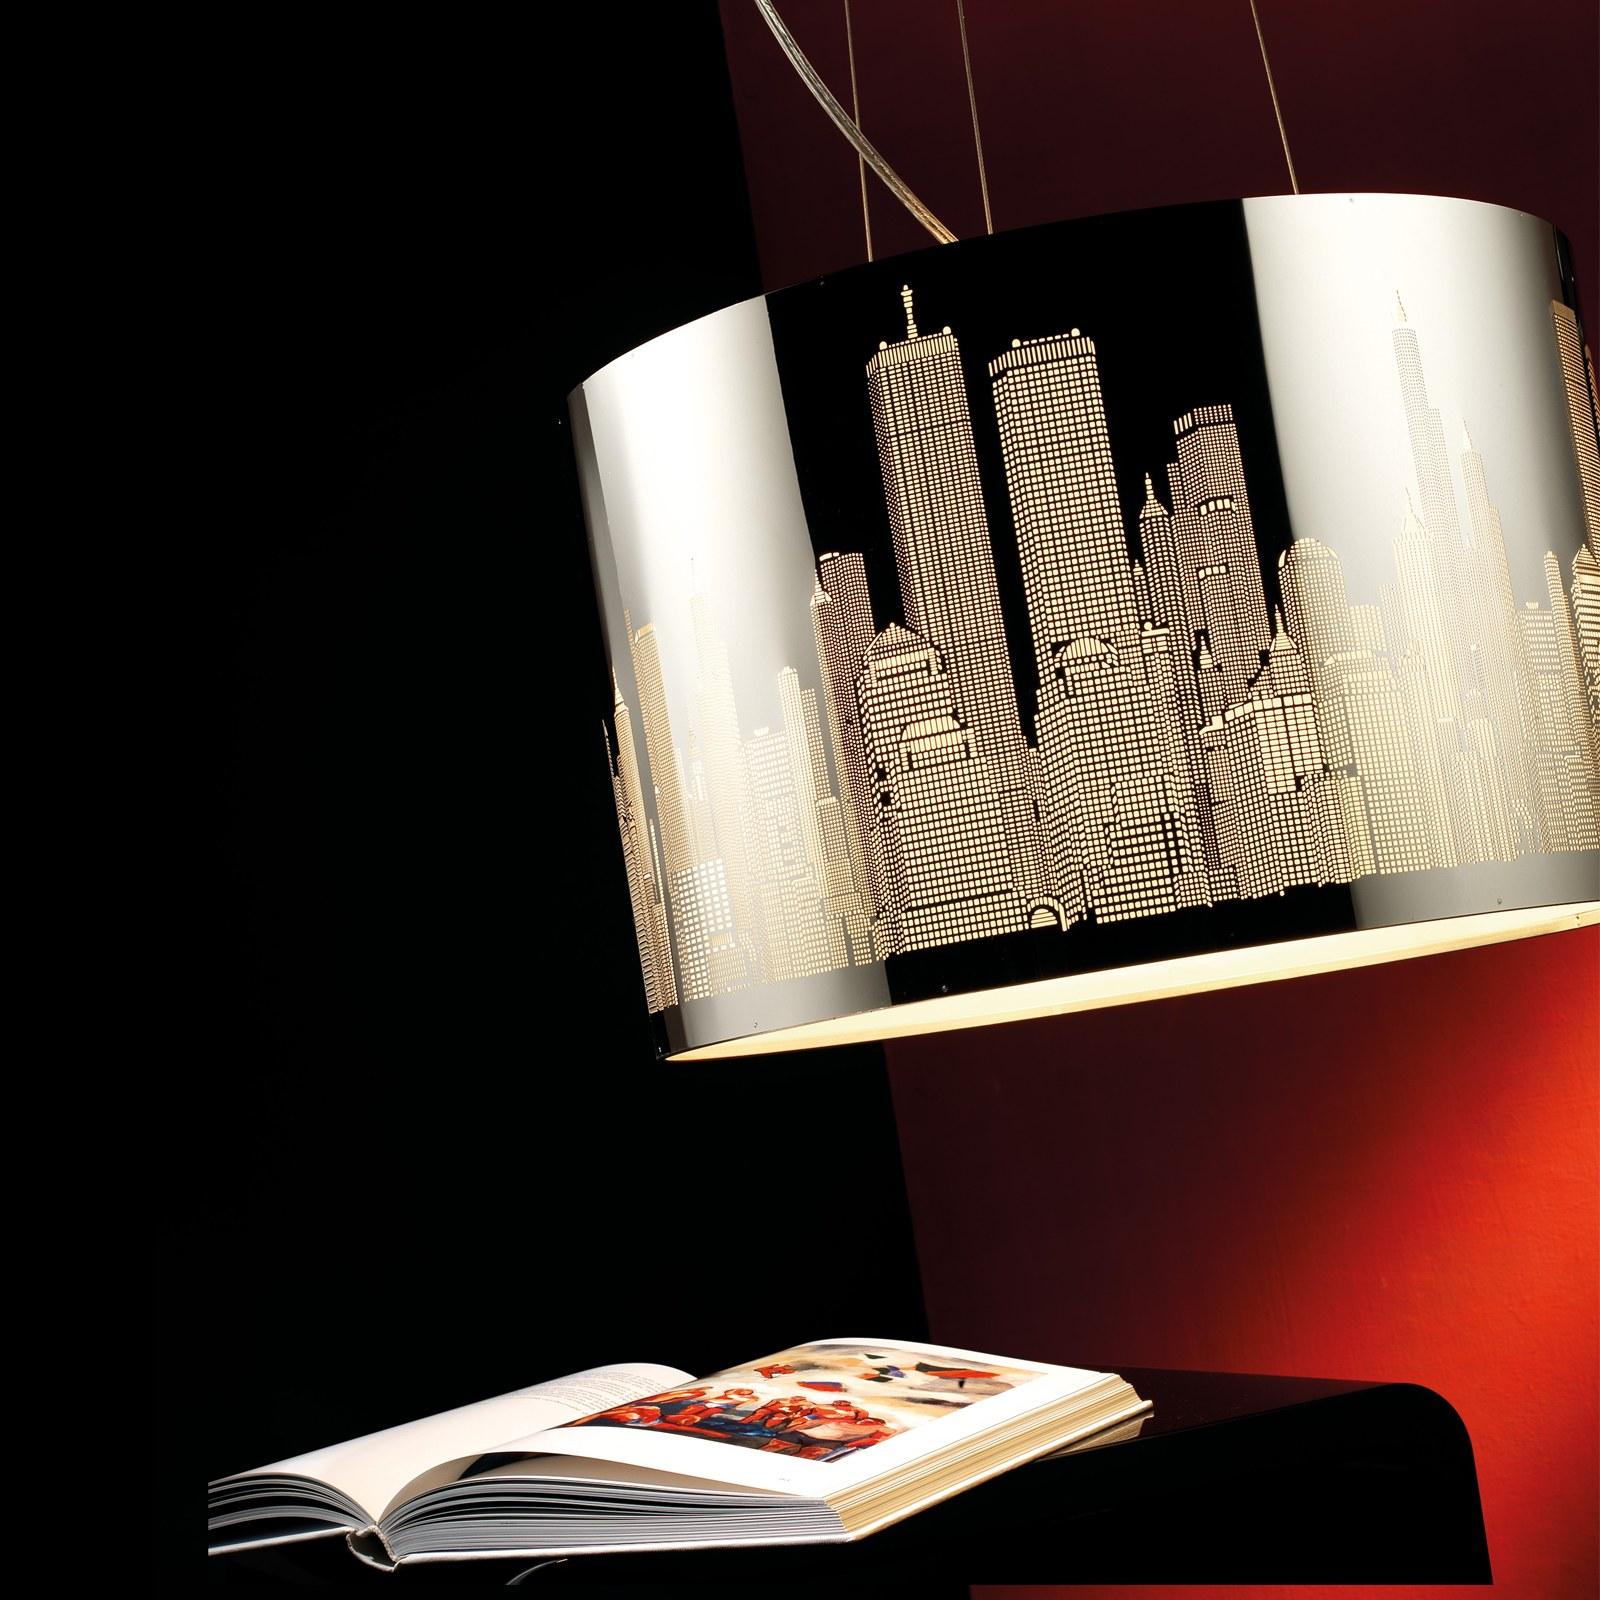 Lampada lampadario soffitto a led sospensione columbus pan ...